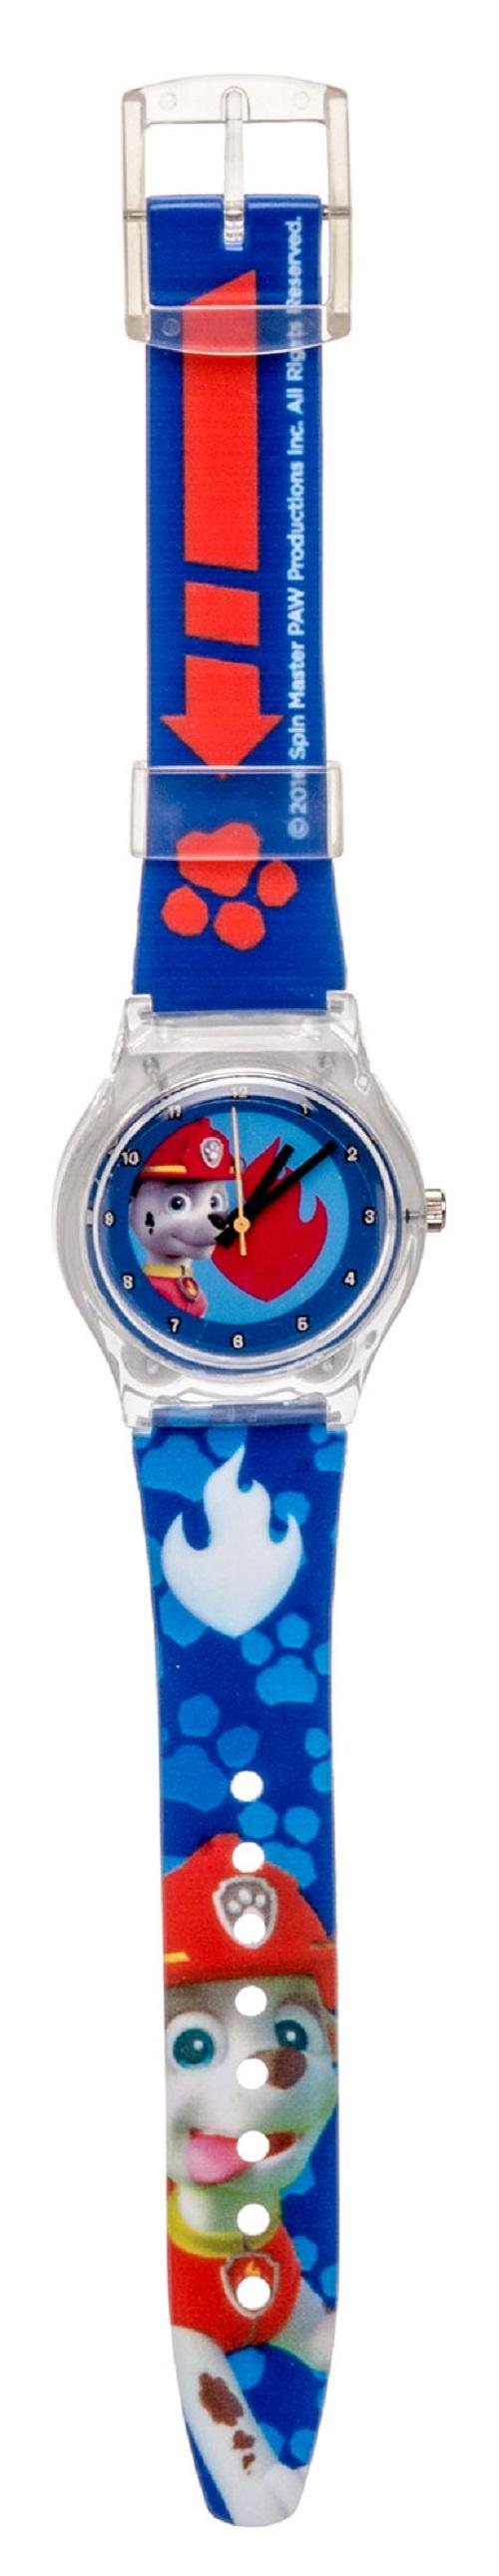 Paw Patrol Kinder-Armbanduhr Variante 3